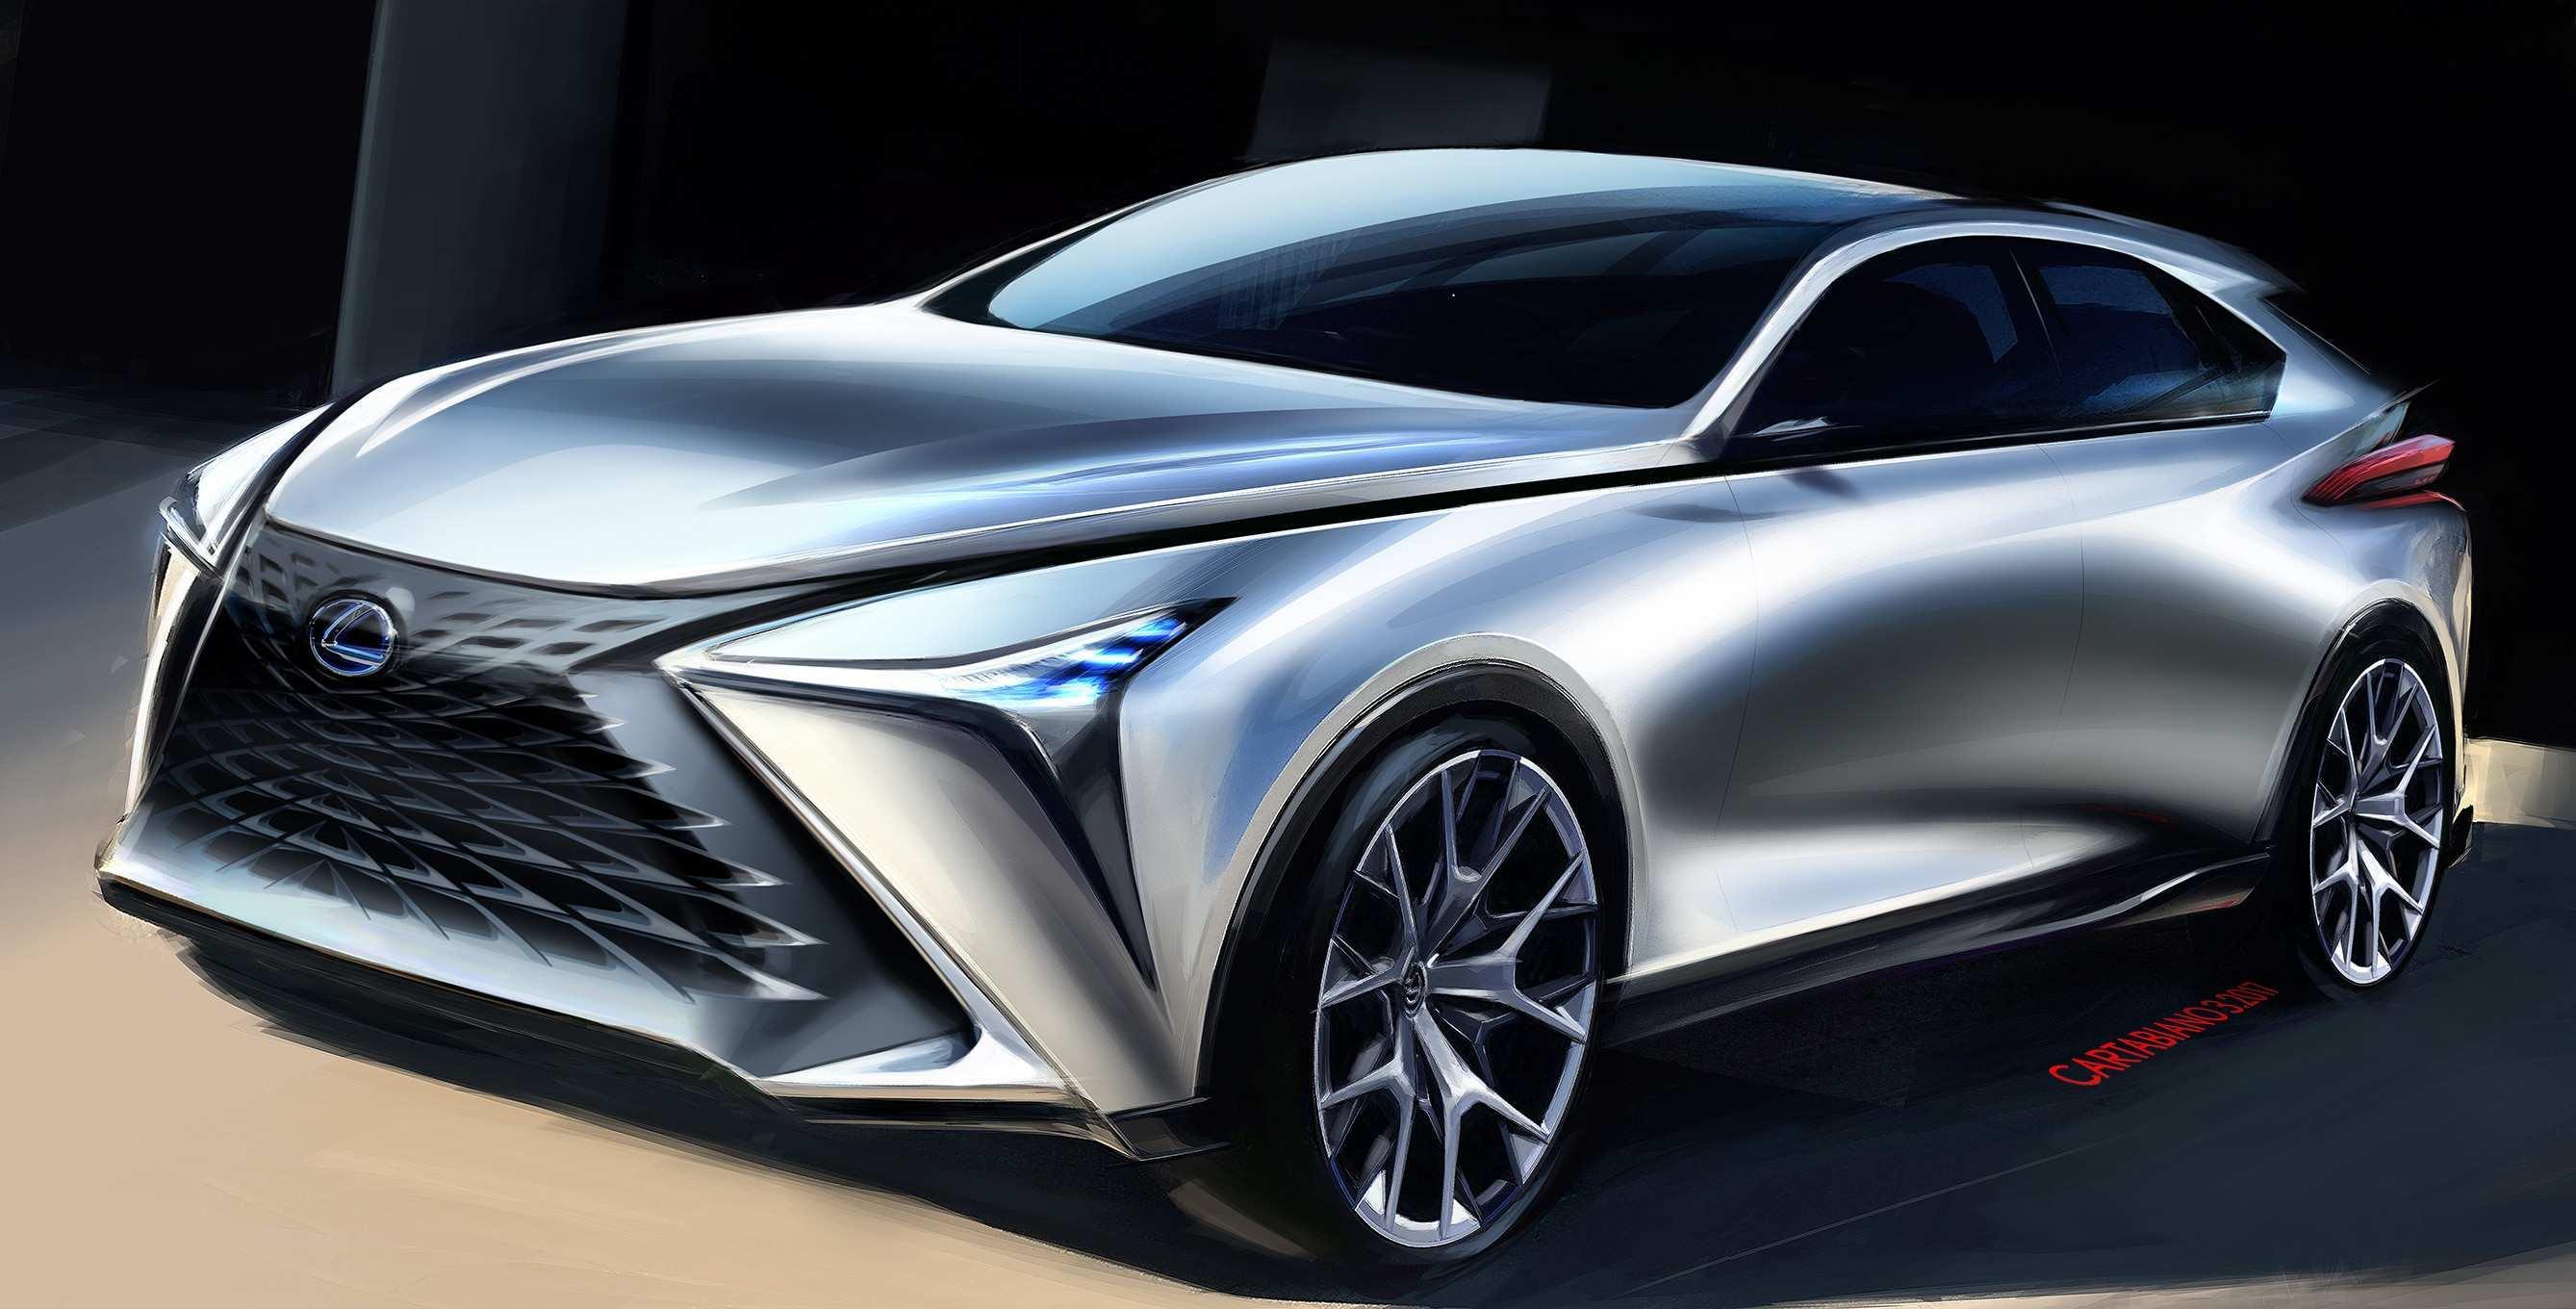 88 New Lexus Lf 1 Limitless 2020 Price with Lexus Lf 1 Limitless 2020